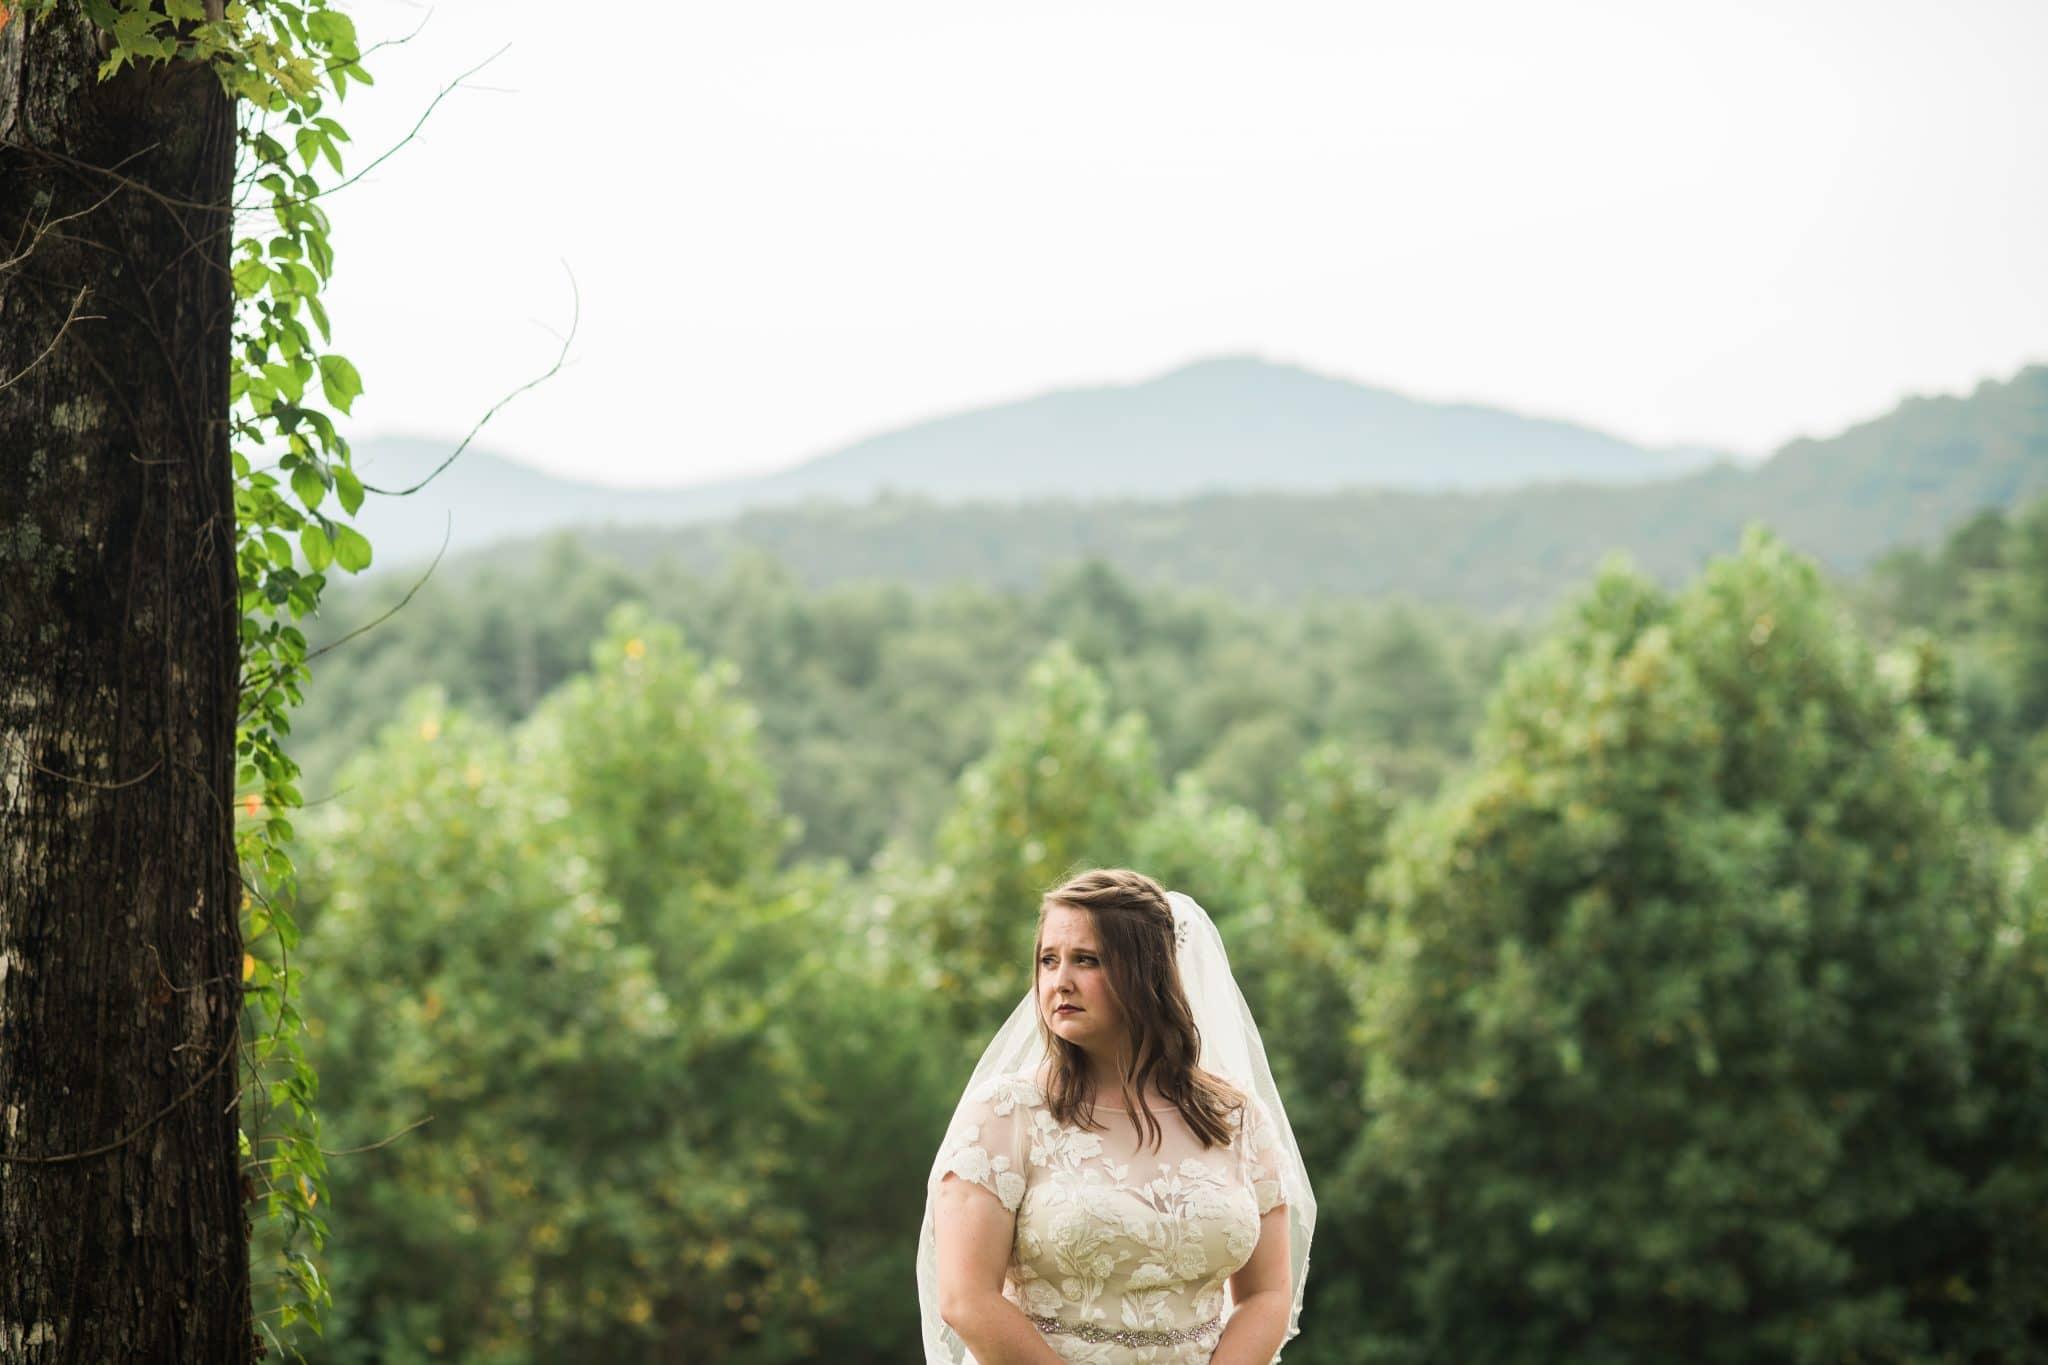 Unicoi State Park Adventure wedding portraits of the bride